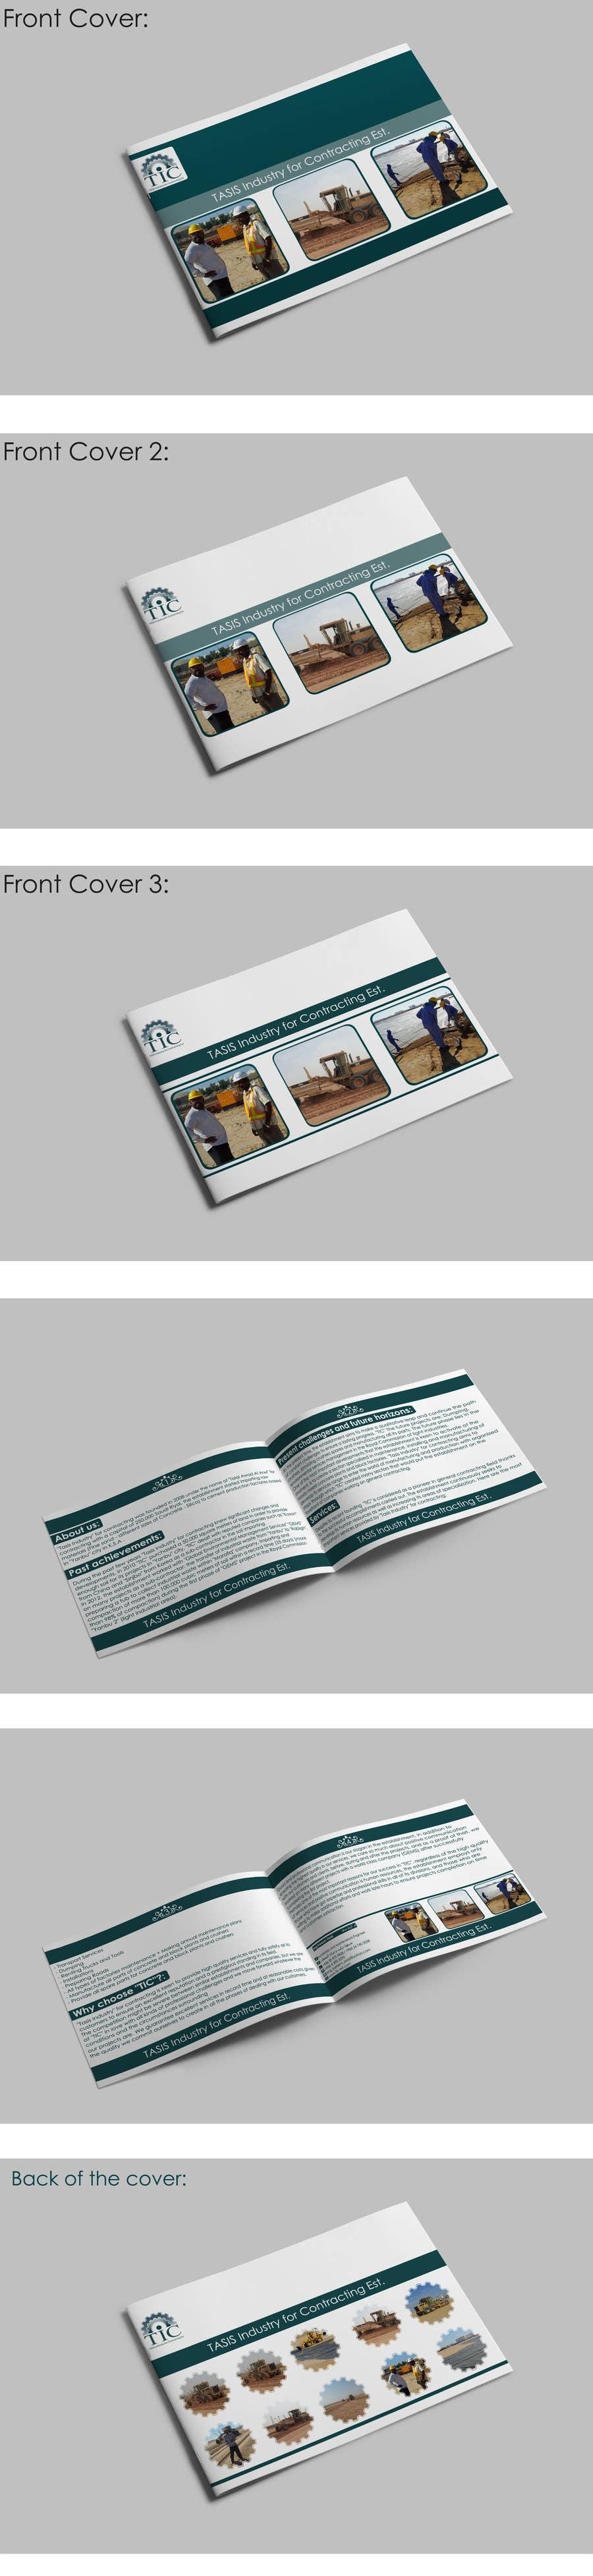 Bài tham dự cuộc thi #                                        5                                      cho                                         Company Profile Design for Contracting Company